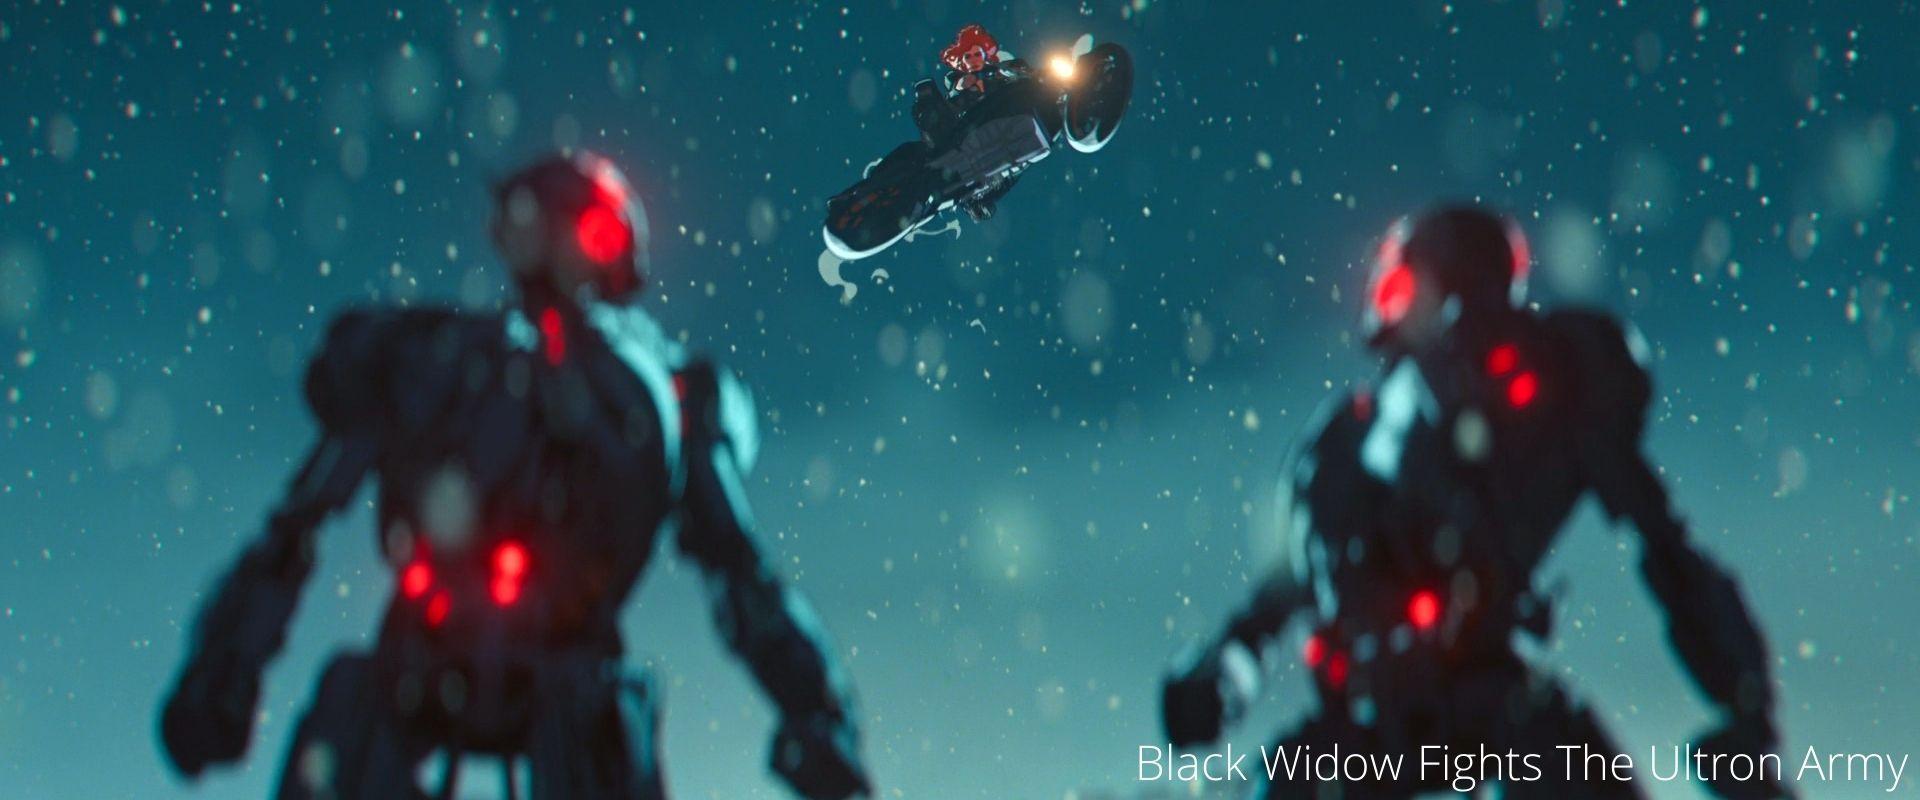 Black Widow in Episode 8